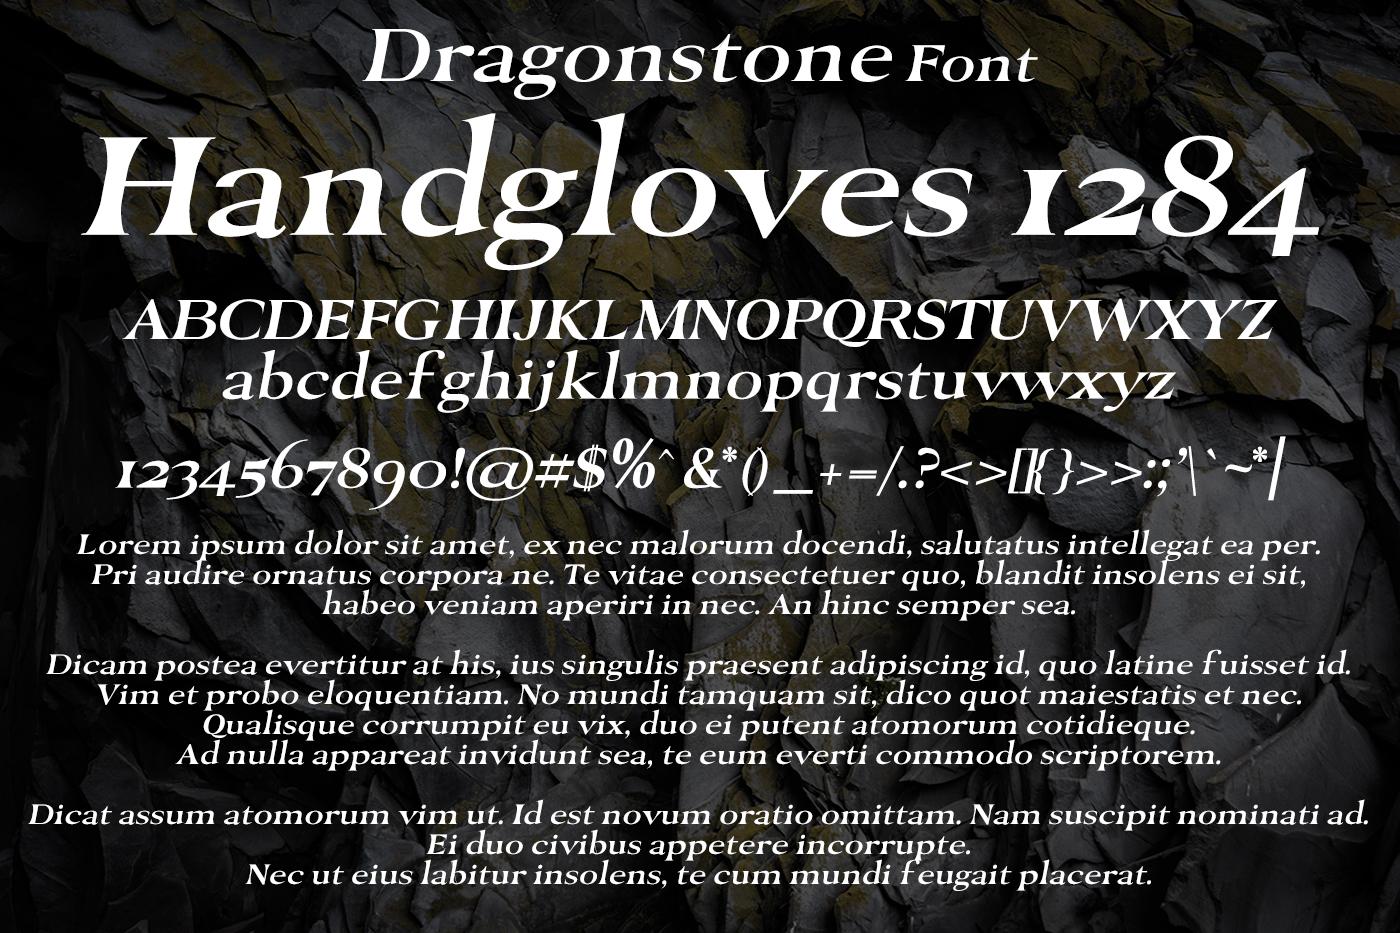 Dragonstone Font example image 2